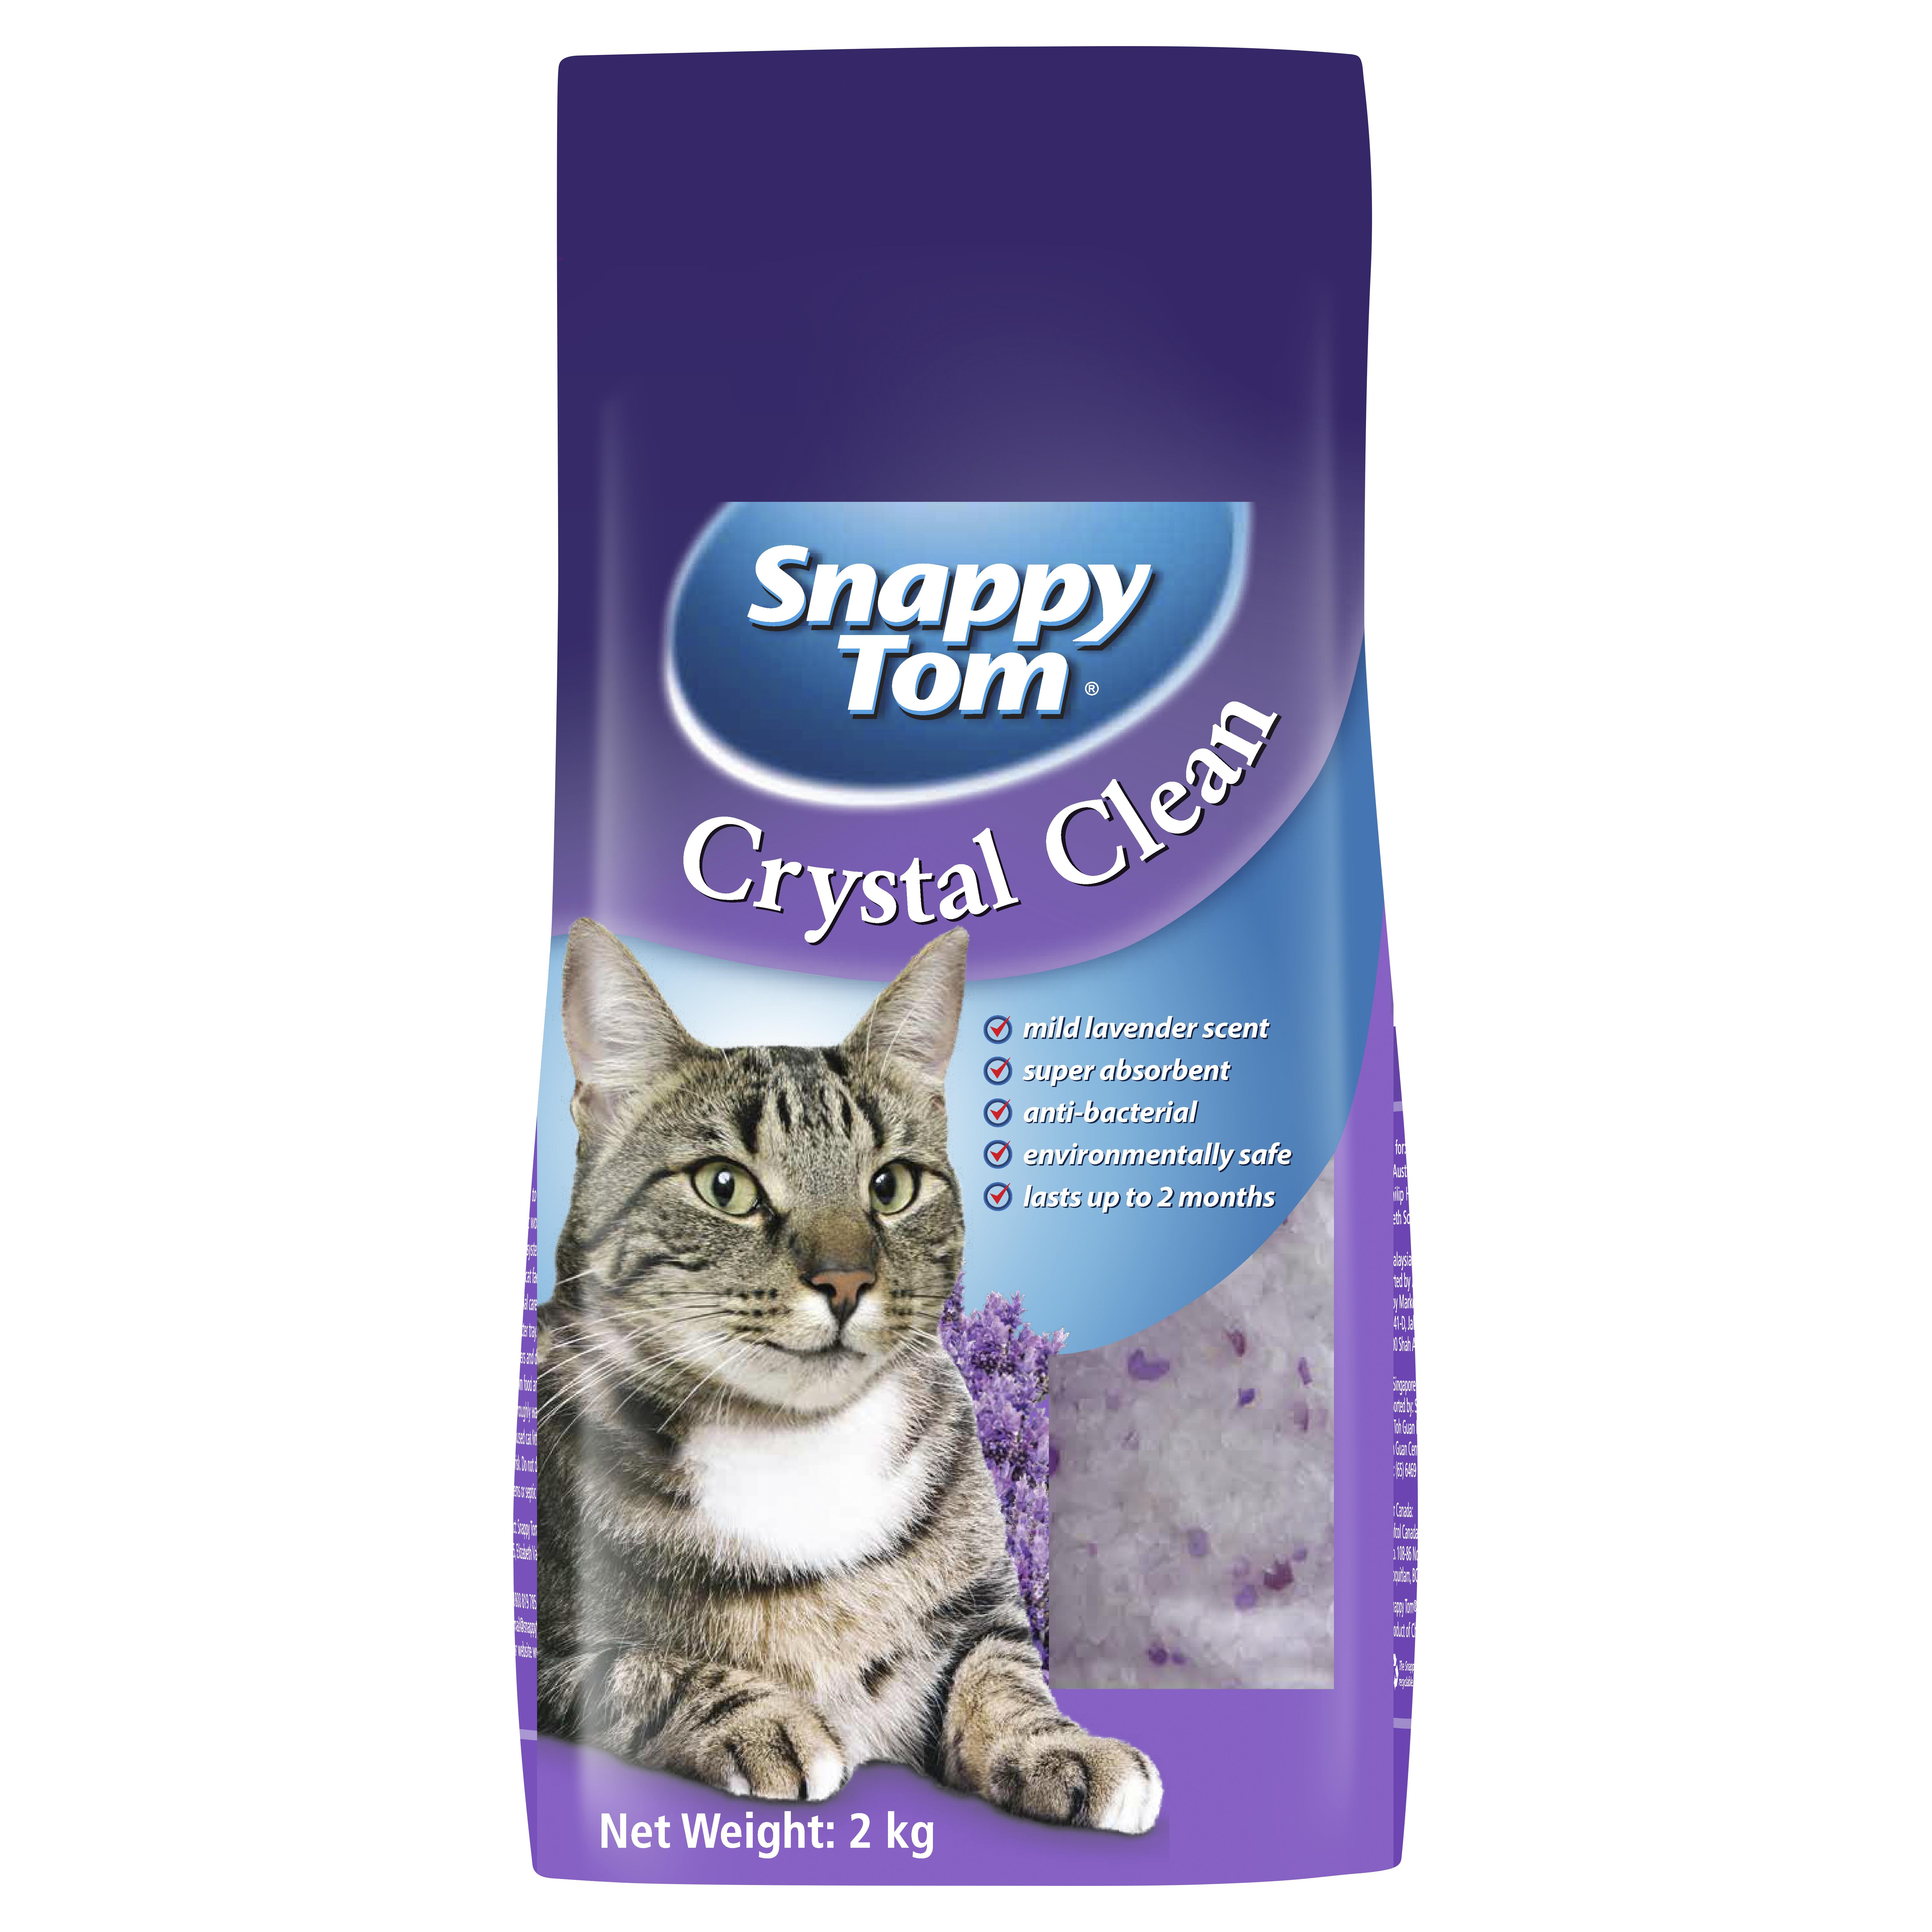 Snappy Tom Crystal Clean Premium Cat Litter Mild Lavender Scented 2kg-1